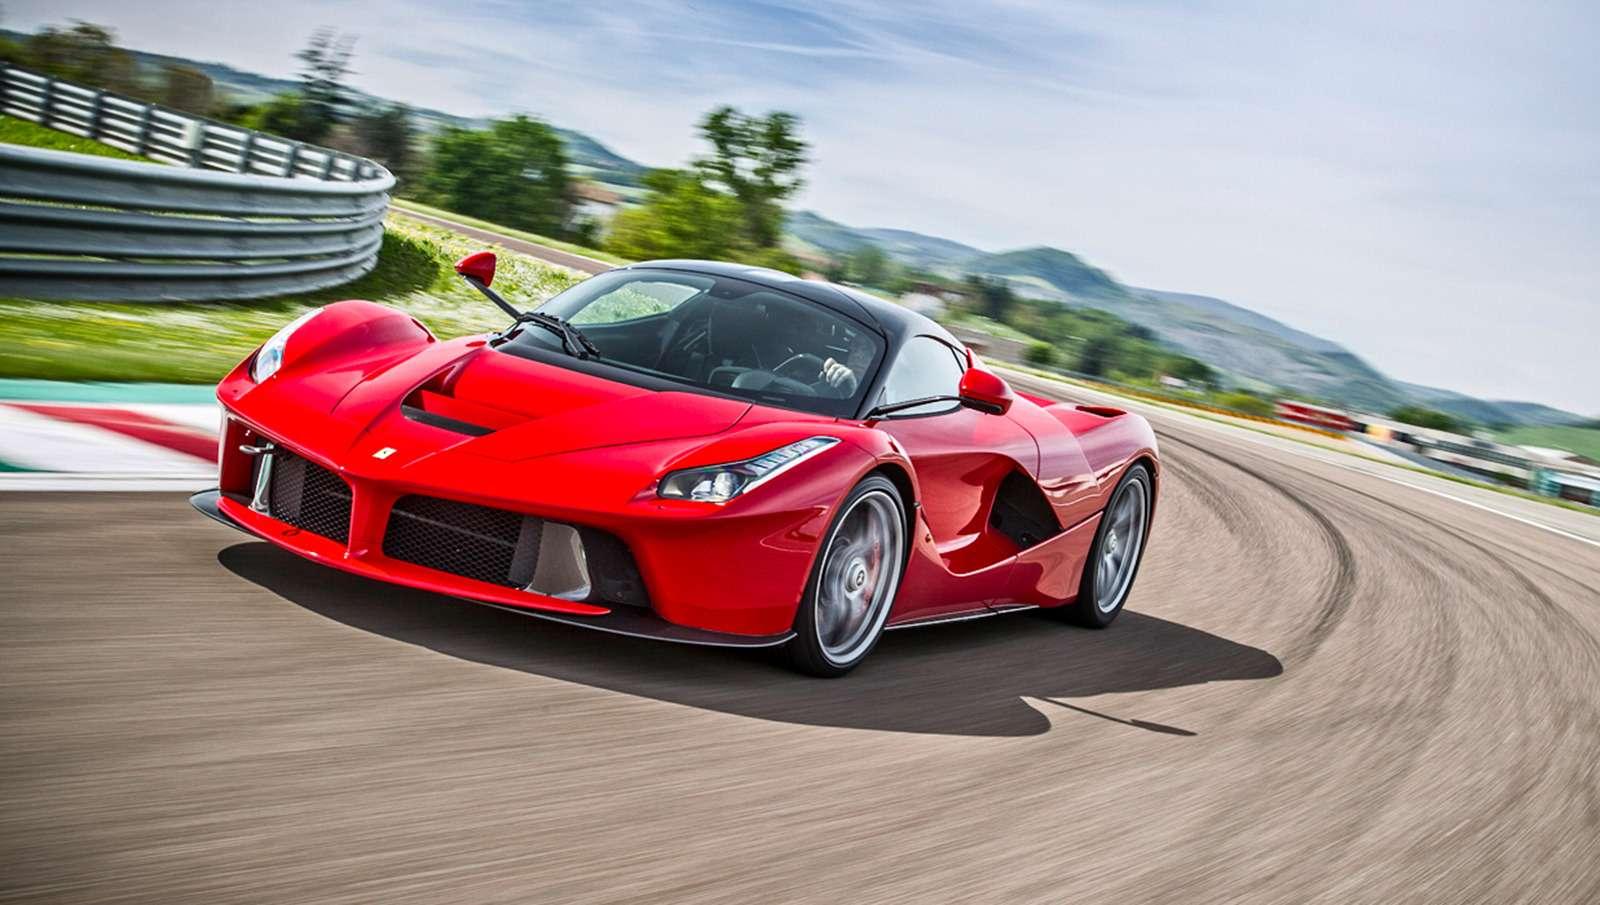 2014-ferrari-laferrari-first-drive-review-car-and-driver-photo-584762-s-original